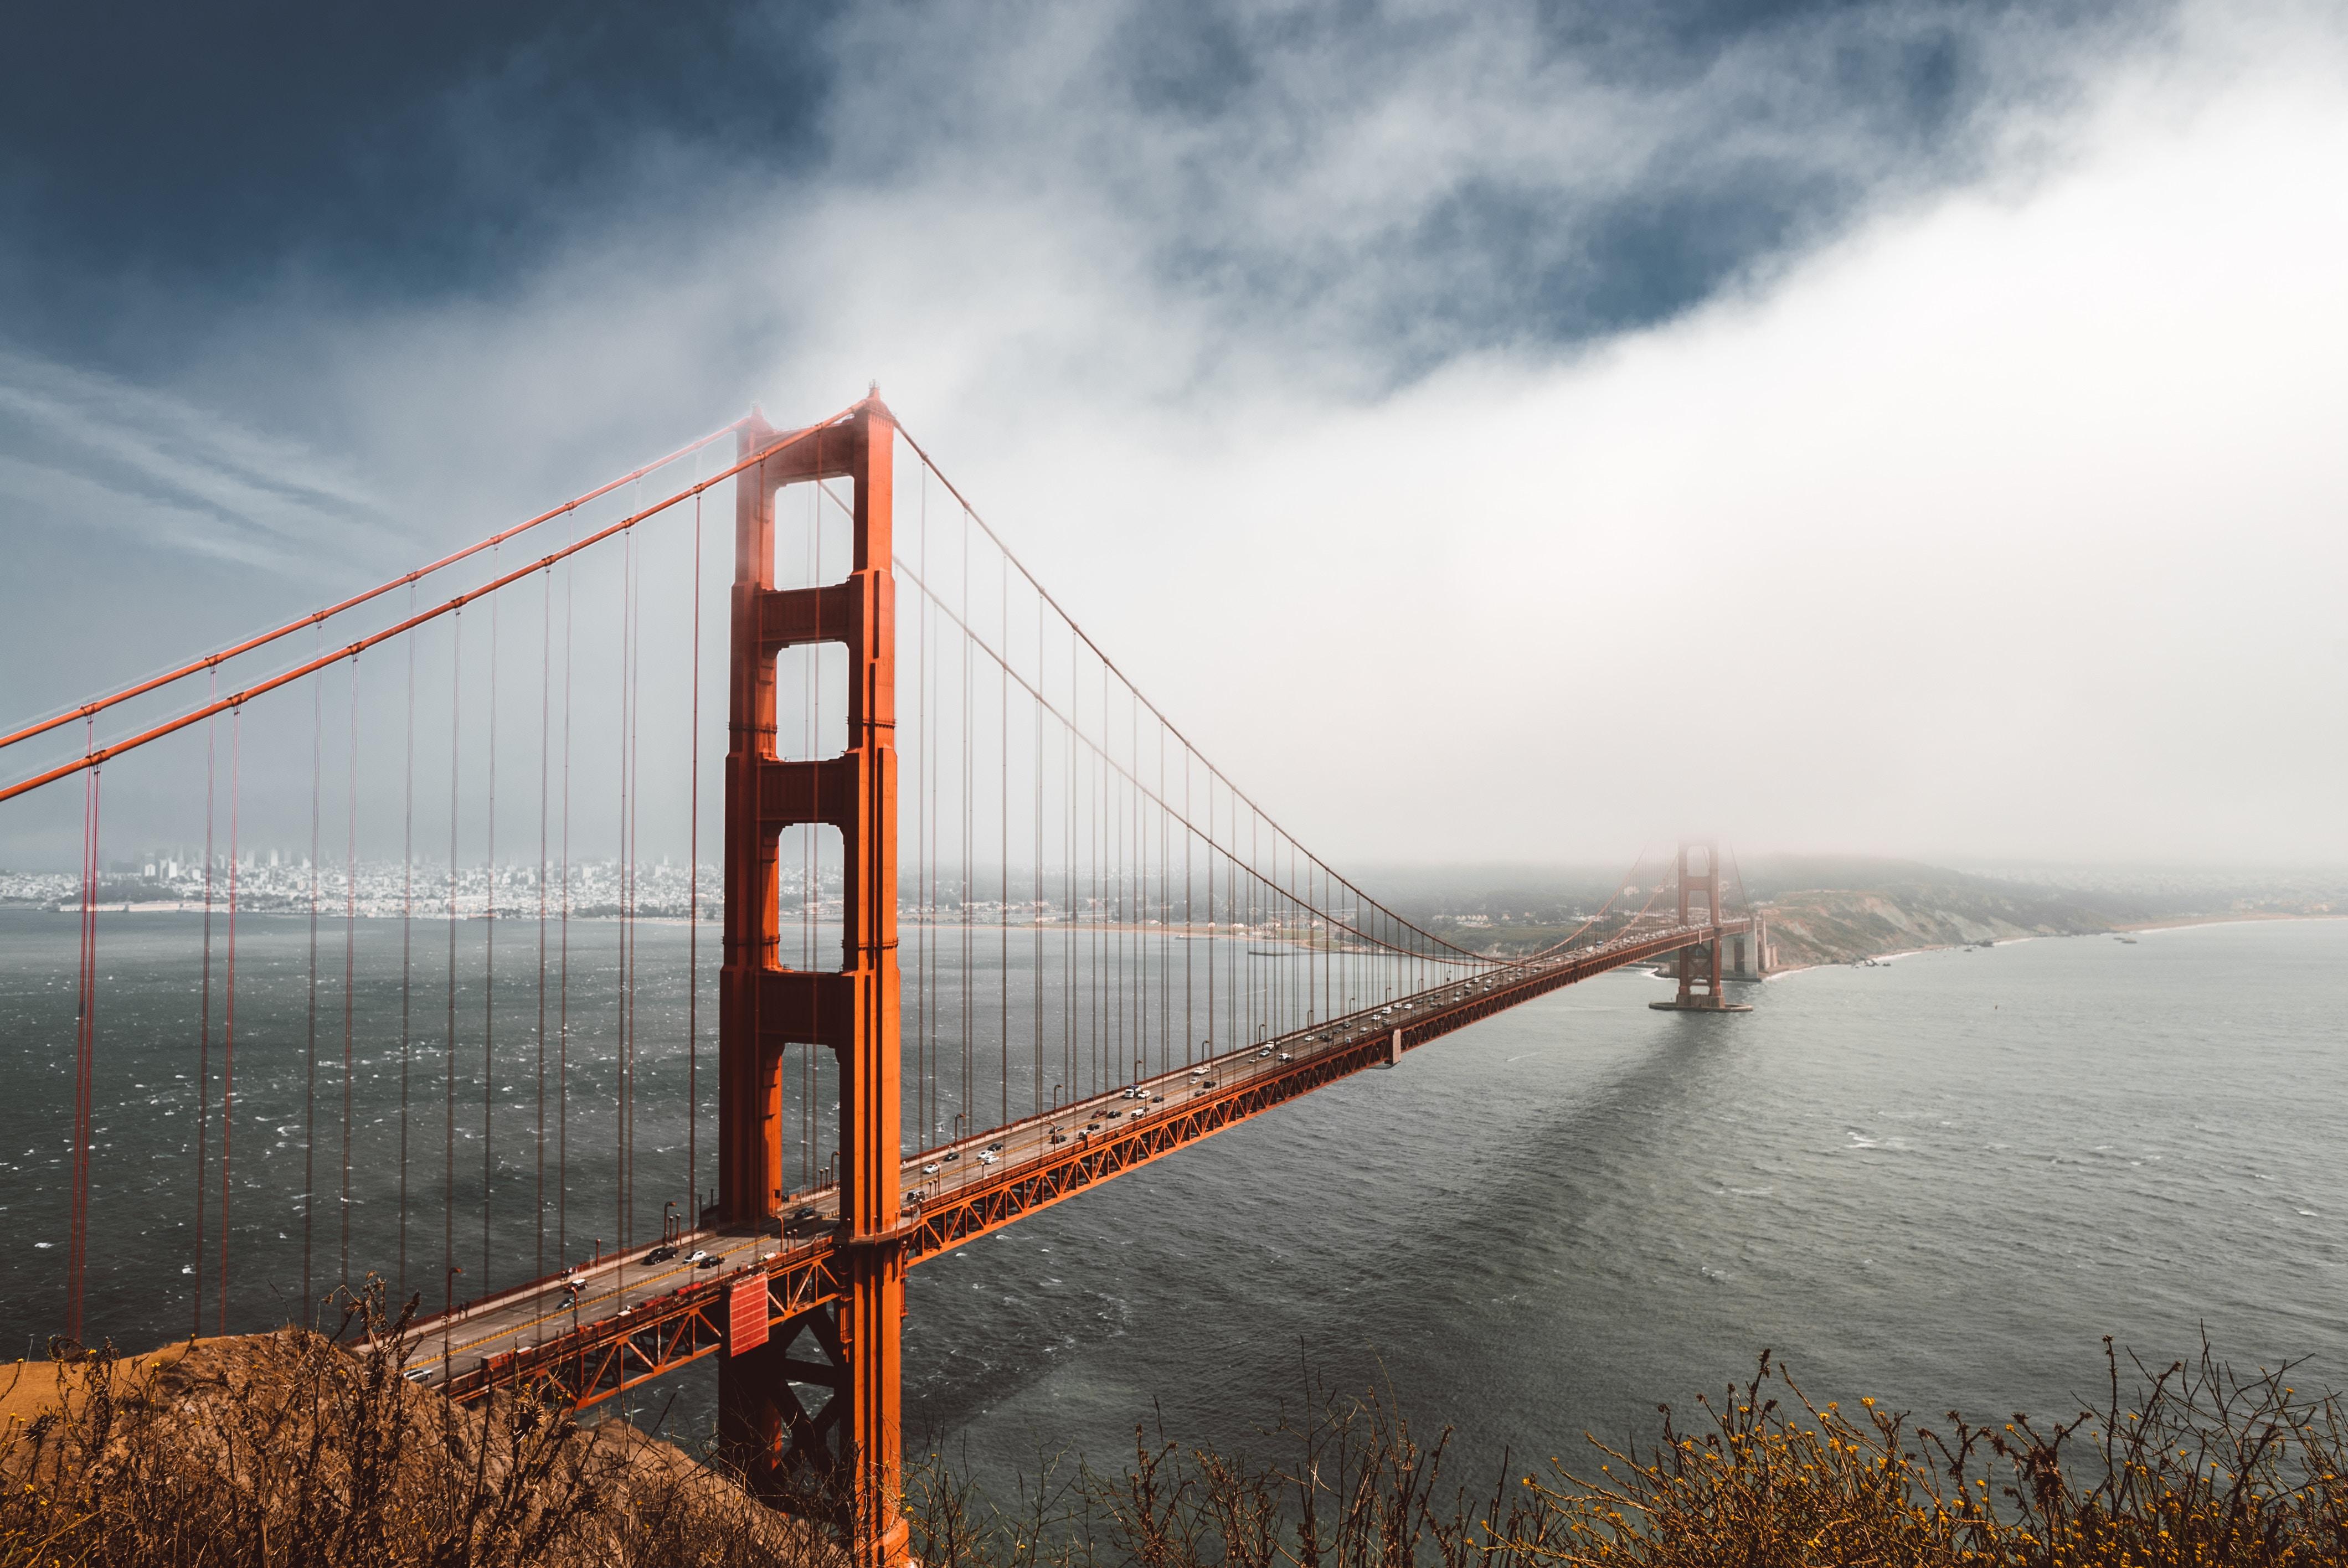 Golden Gate Bridge 4k: 4k Golden Gate Bridge, HD World, 4k Wallpapers, Images